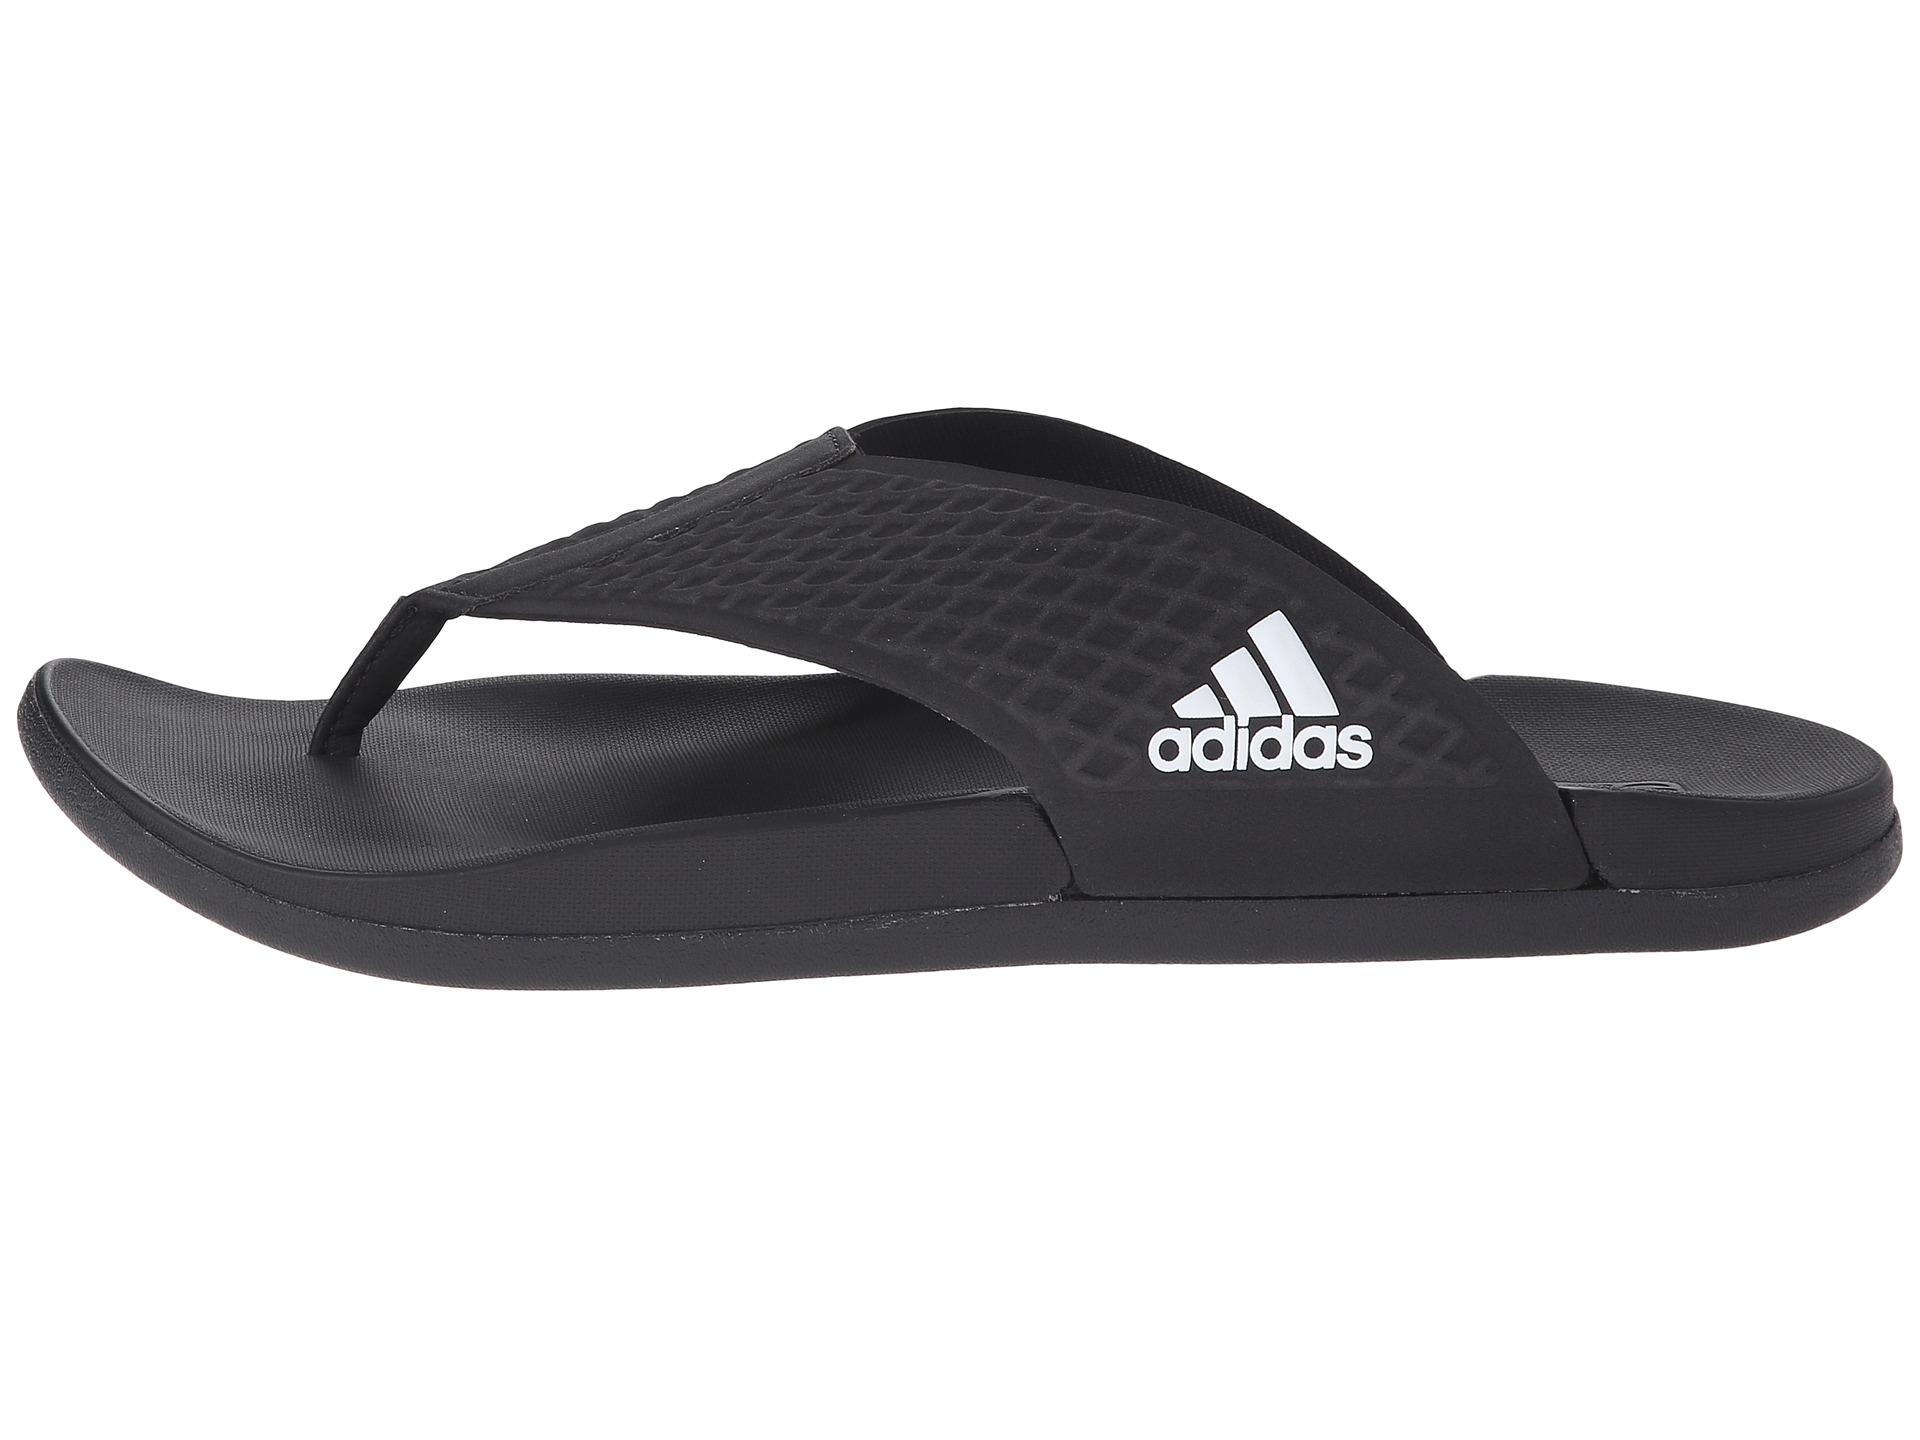 5bec9b47834a6a Lyst - adidas Originals Adilette Sc Plus Thong in Black for Men